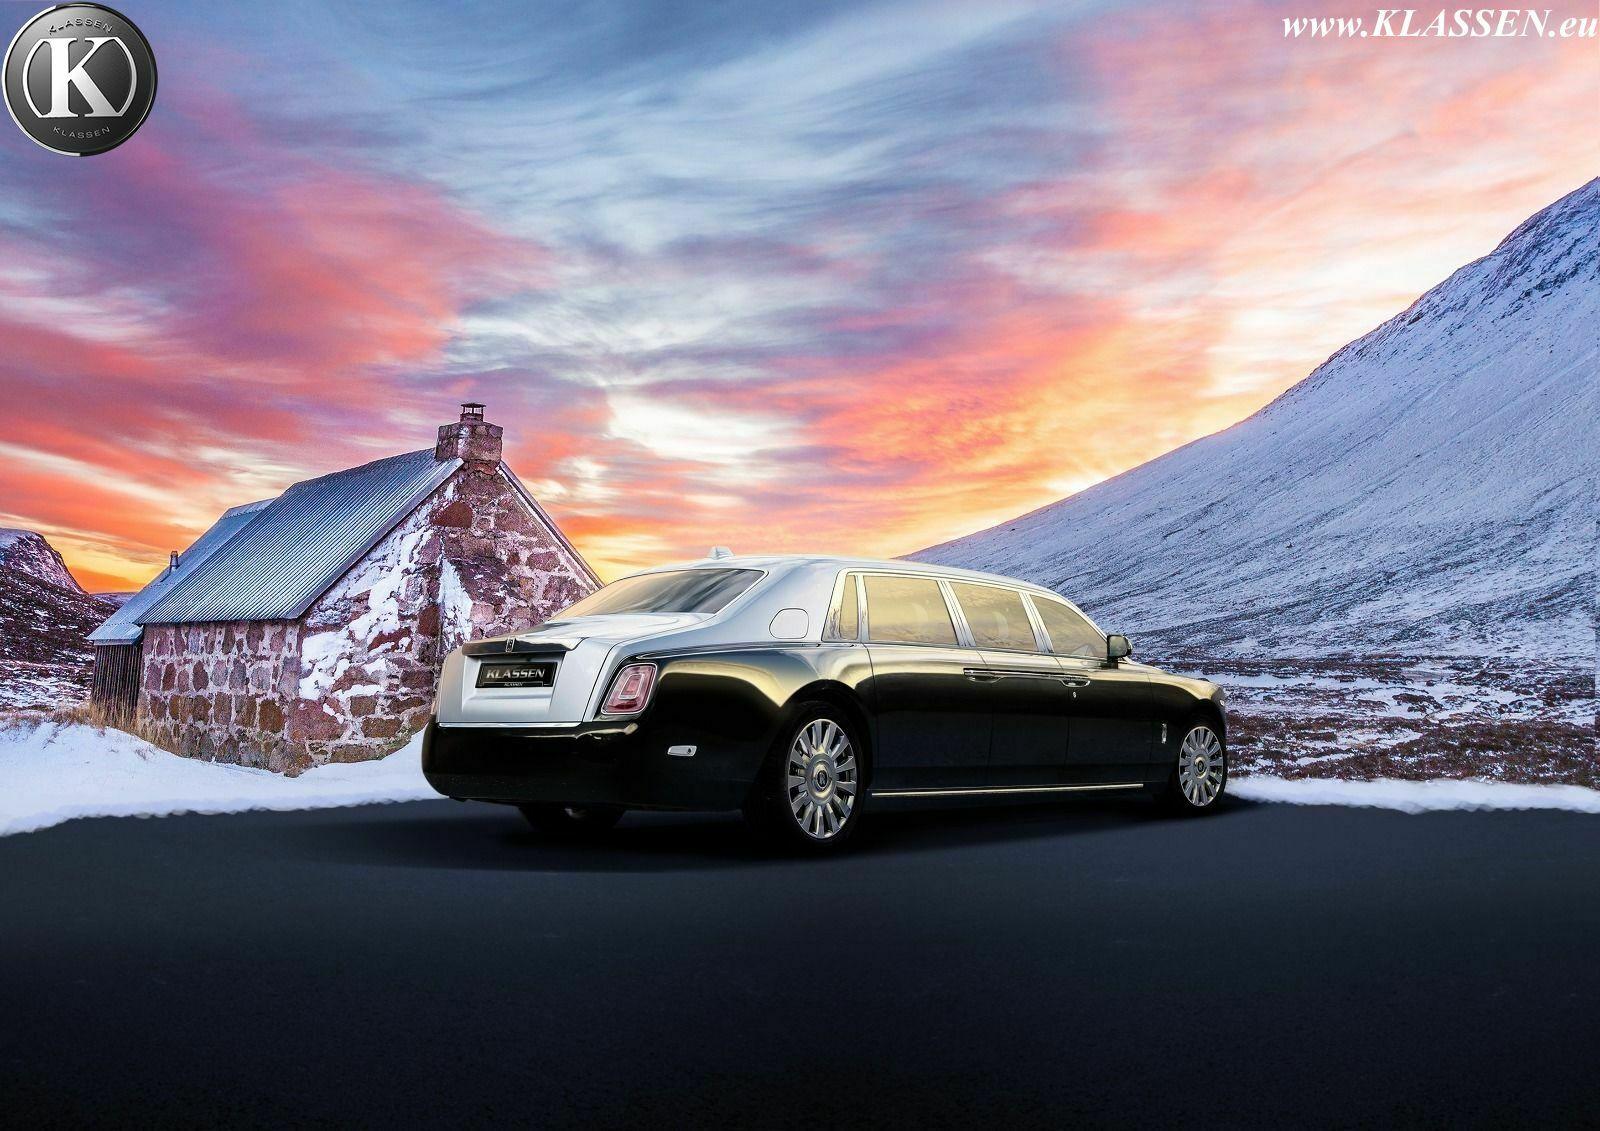 Rolls-Royce-Phantom-by-Klassen-2